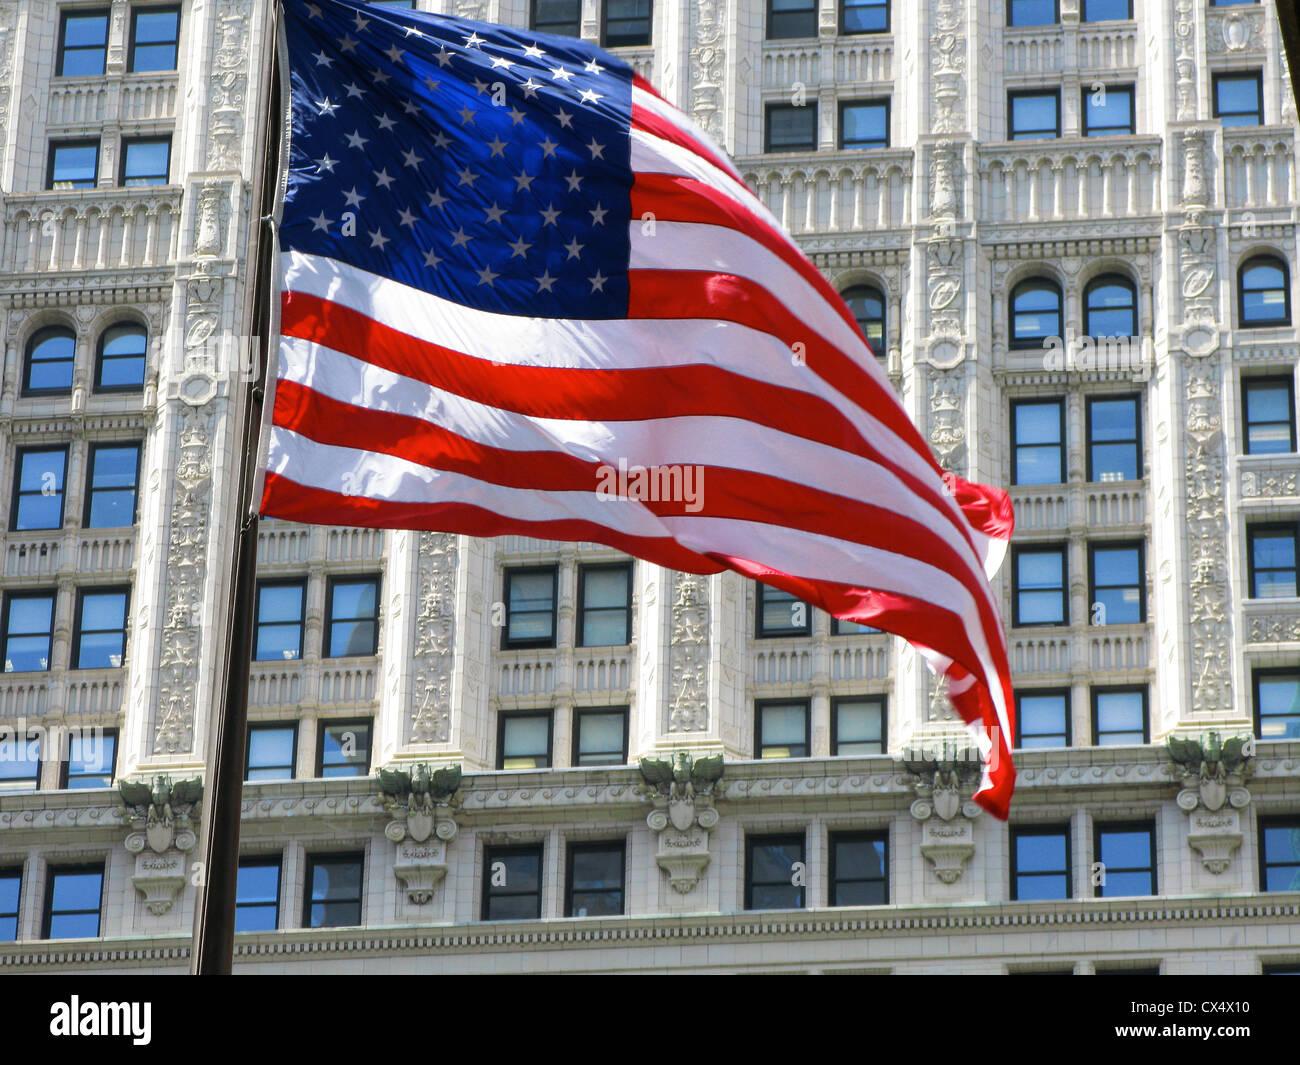 Stars and stripes, US flag flying, on flagpole, Broadway, New York. - Stock Image